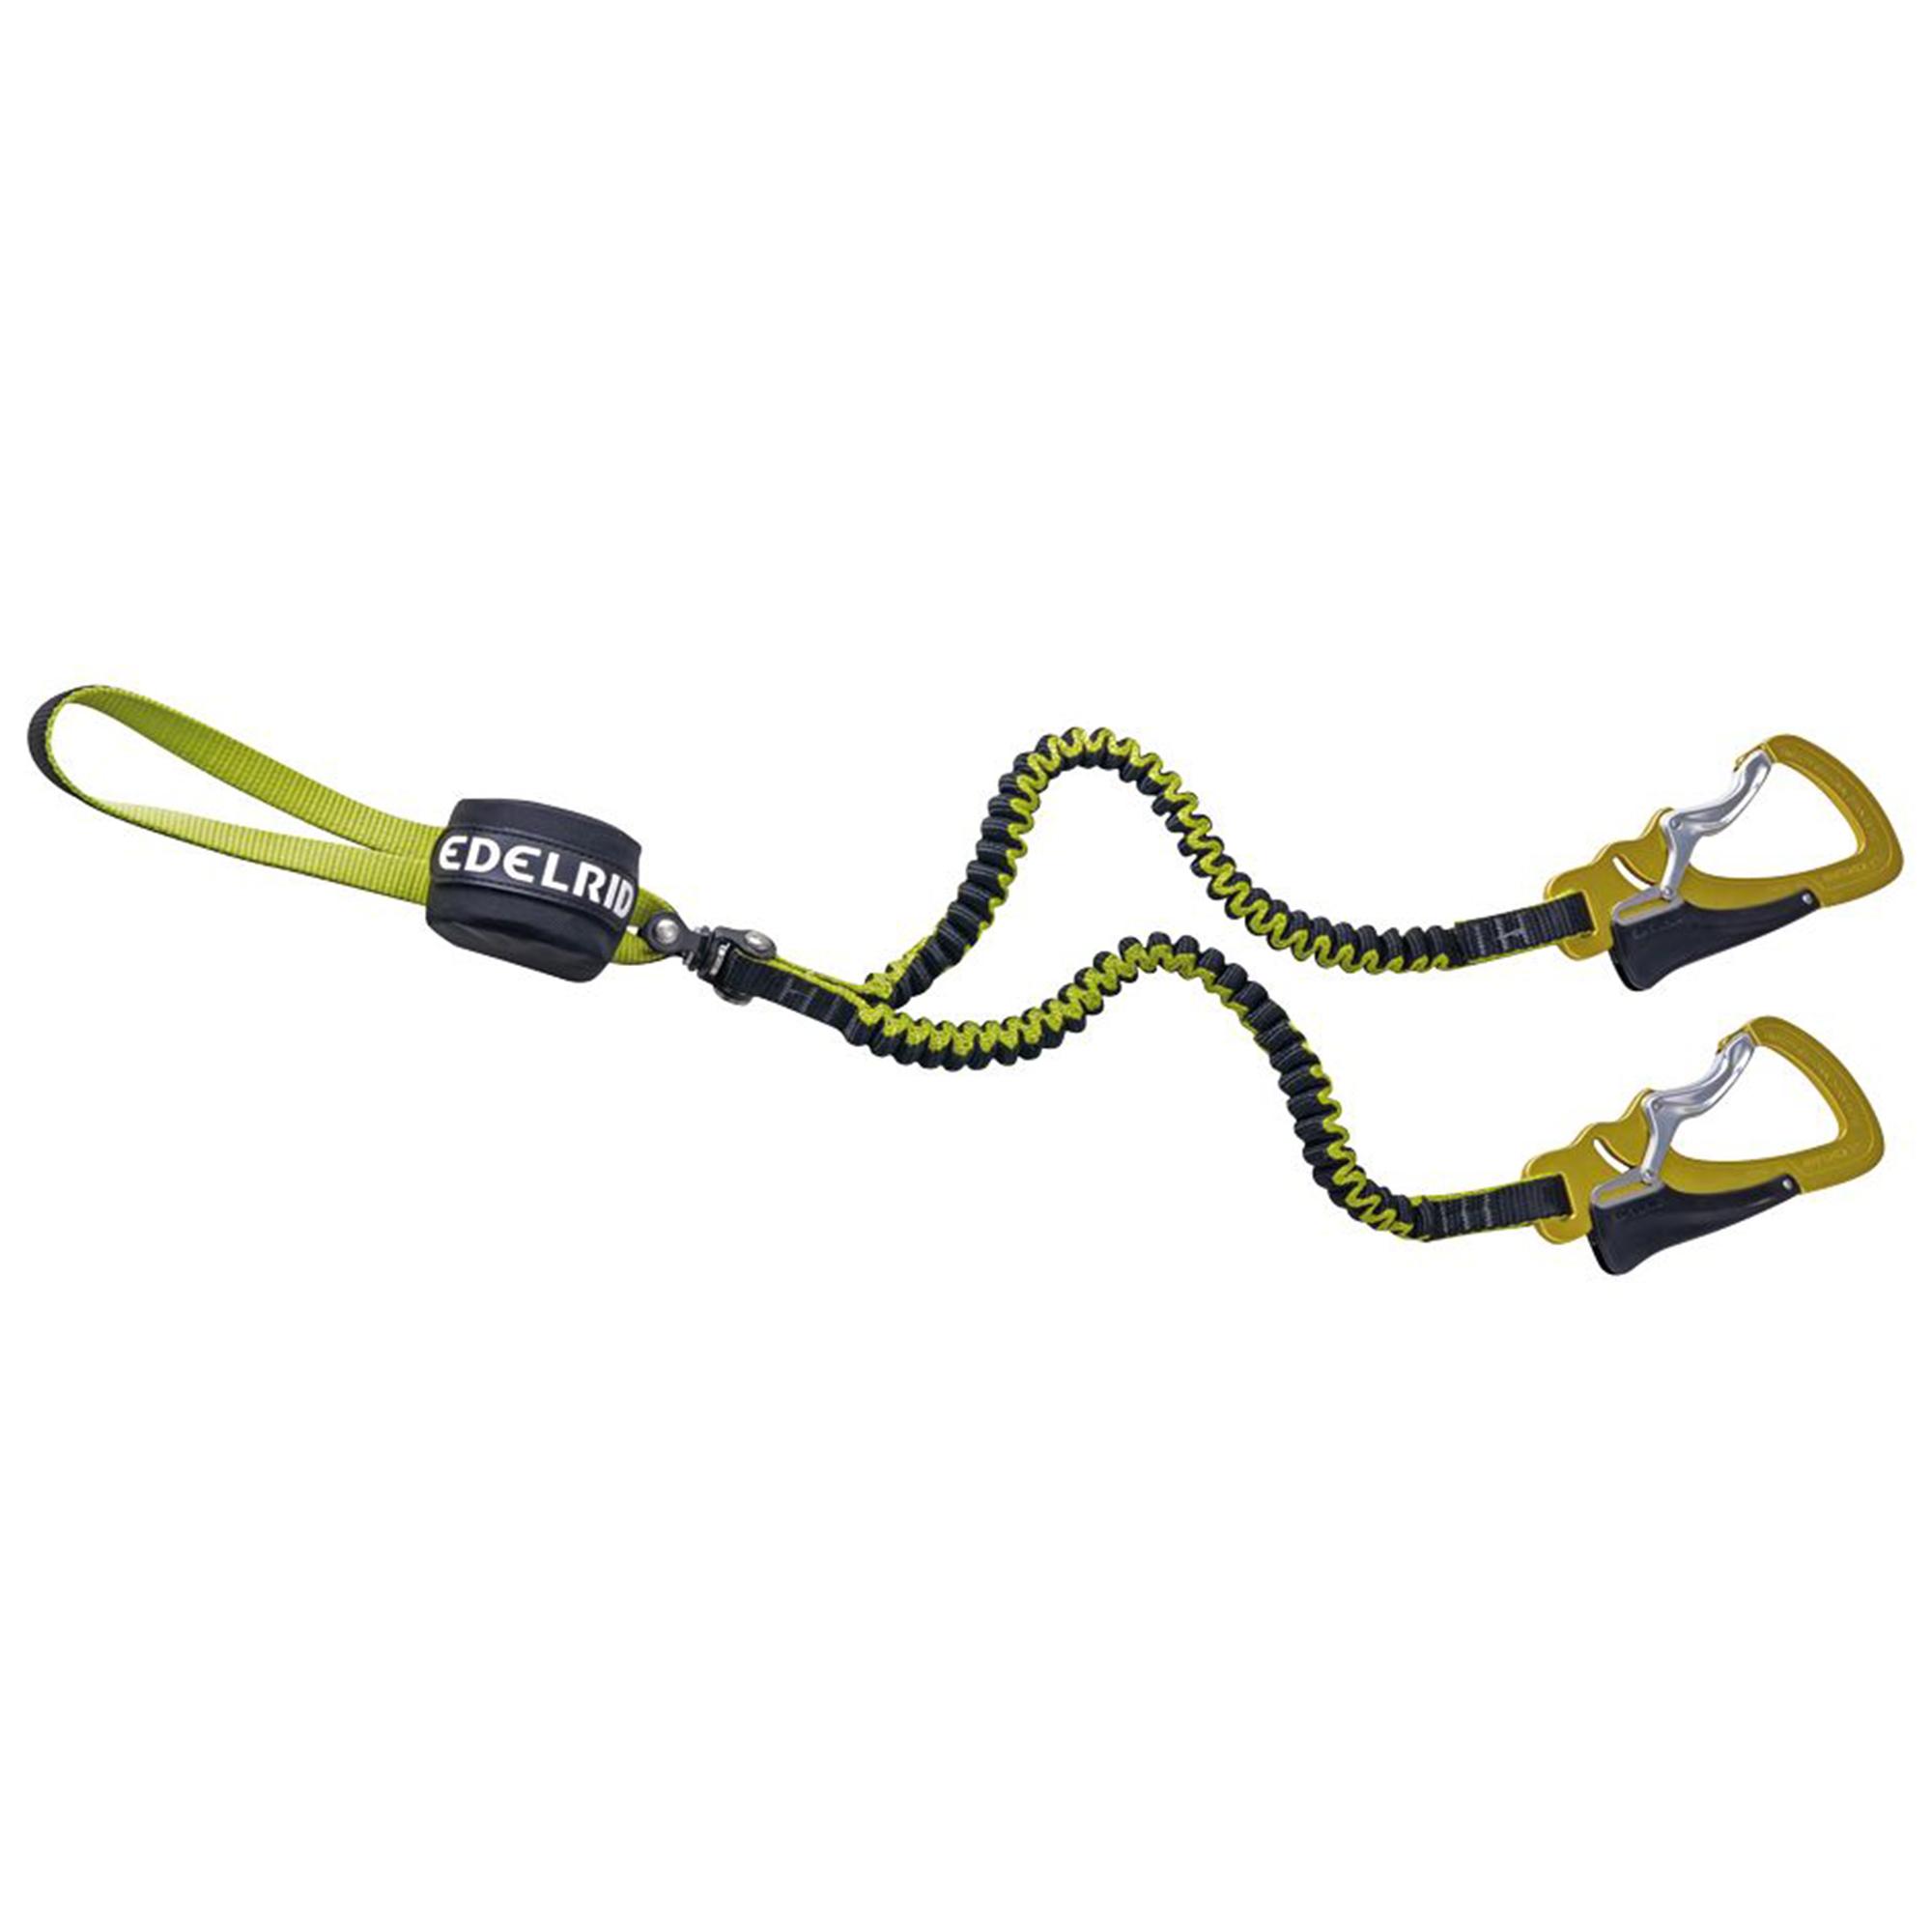 Klettersteigset Edelrid Cable Comfort 2.3 night-oasis